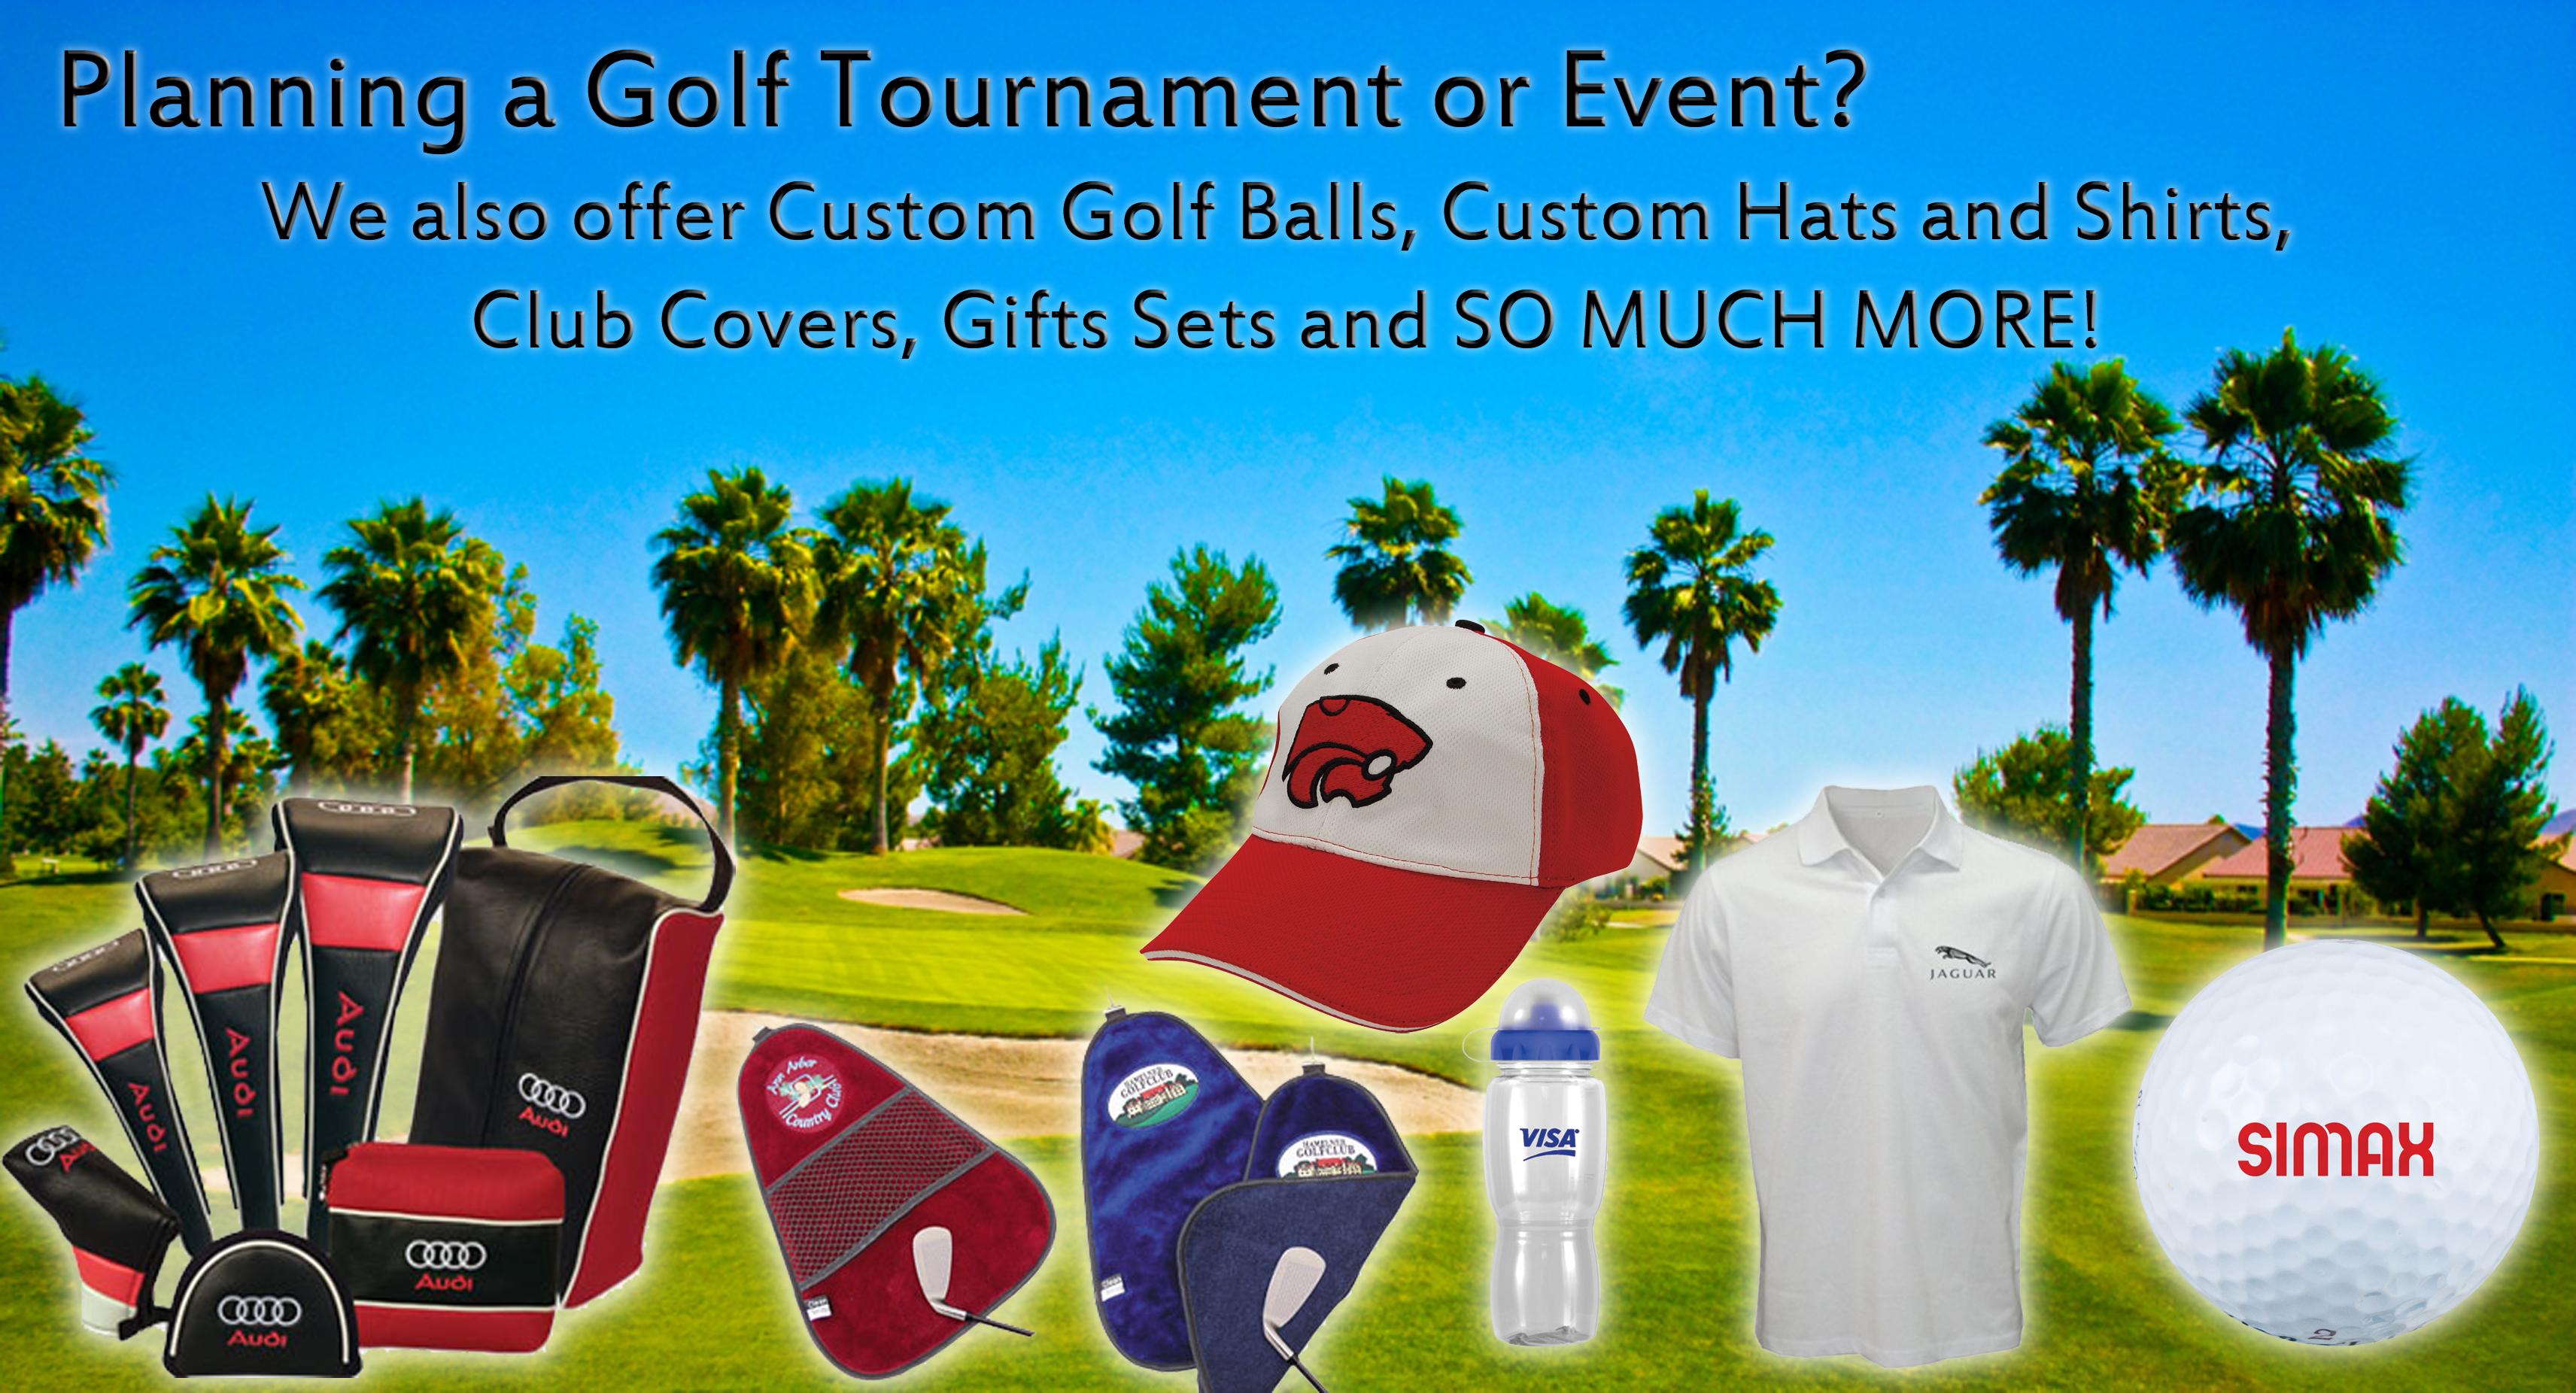 golf-events-custom-golf-items.png